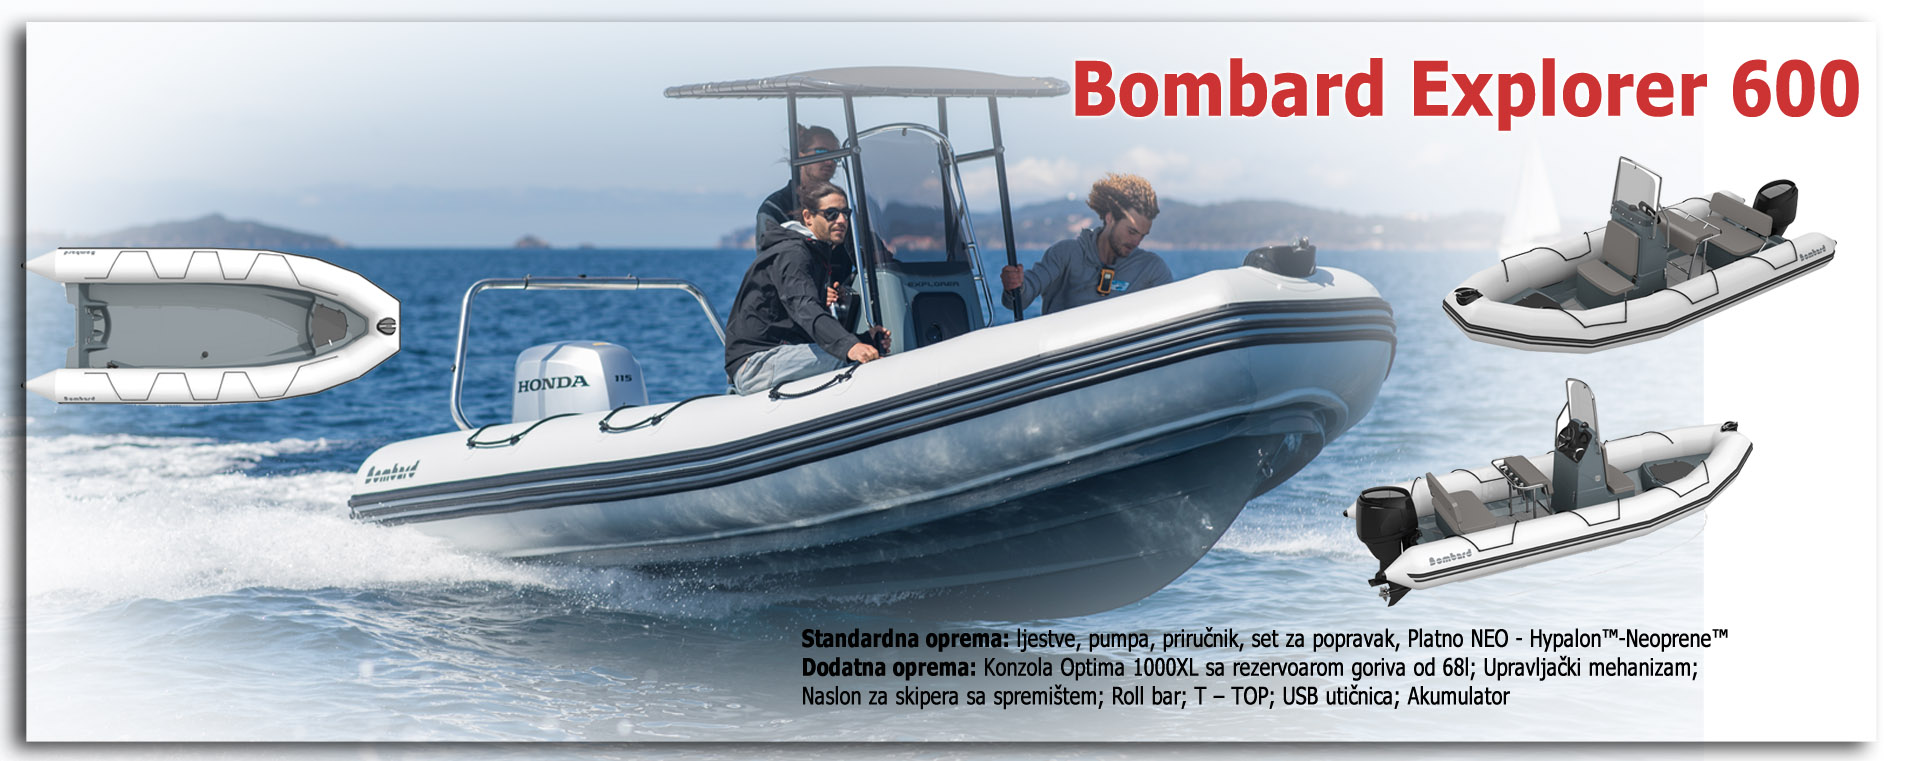 Bombard Explorer 600